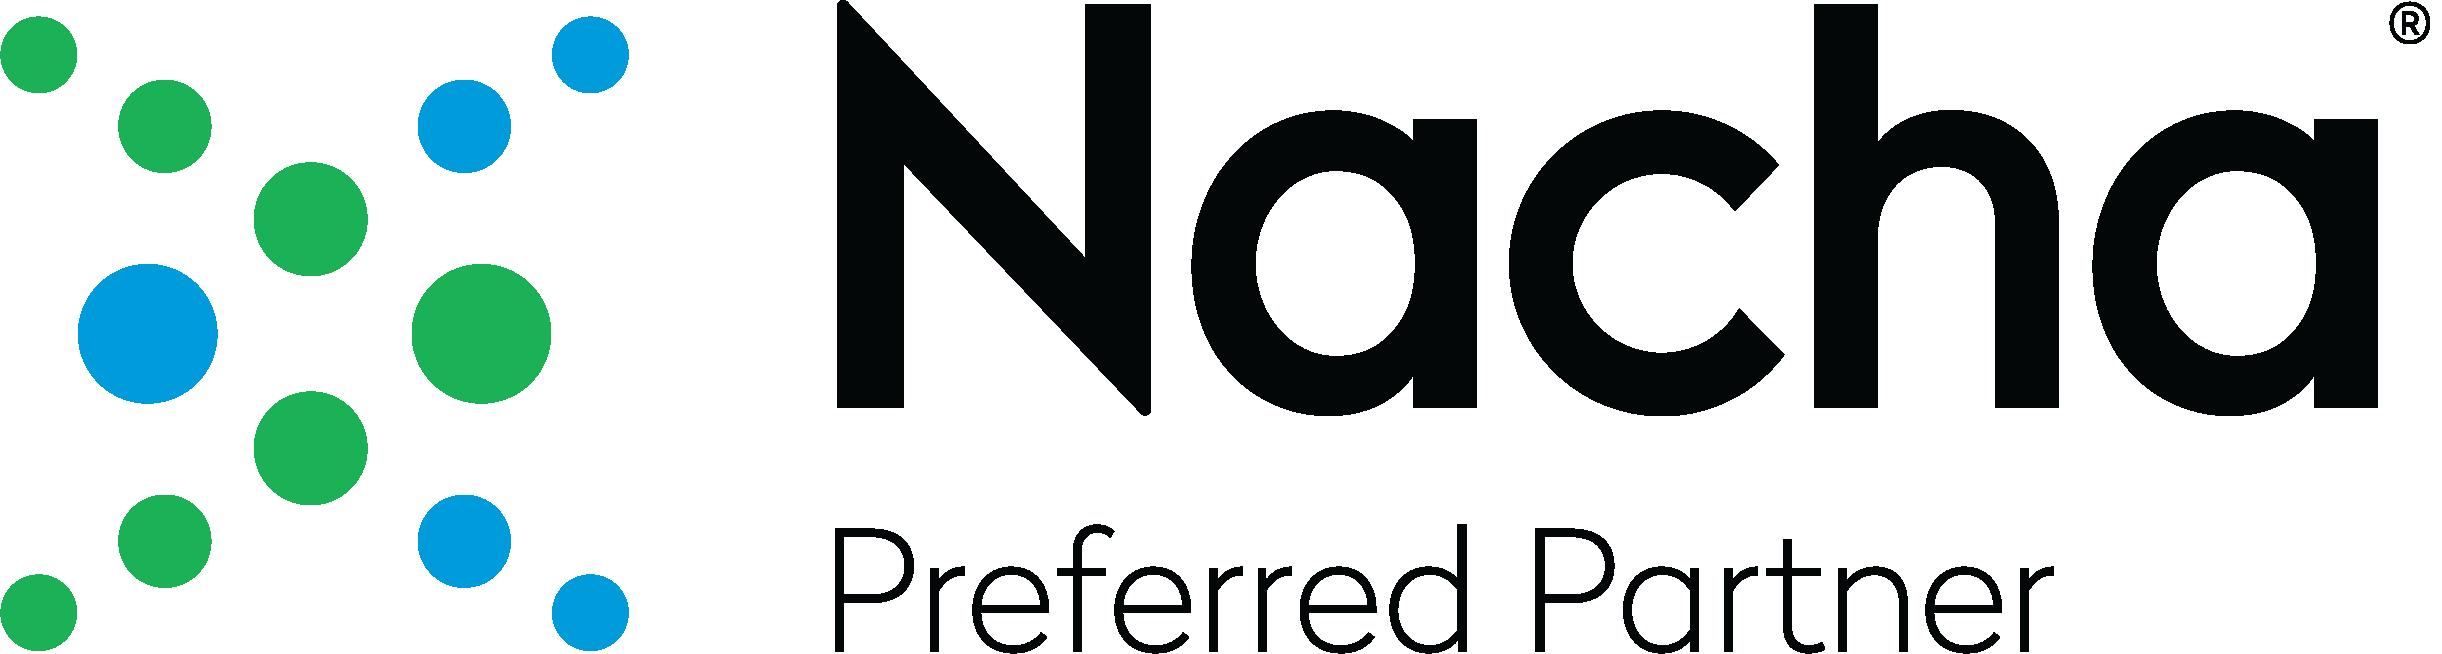 ValidiFI is a NACHA Preferred Partner